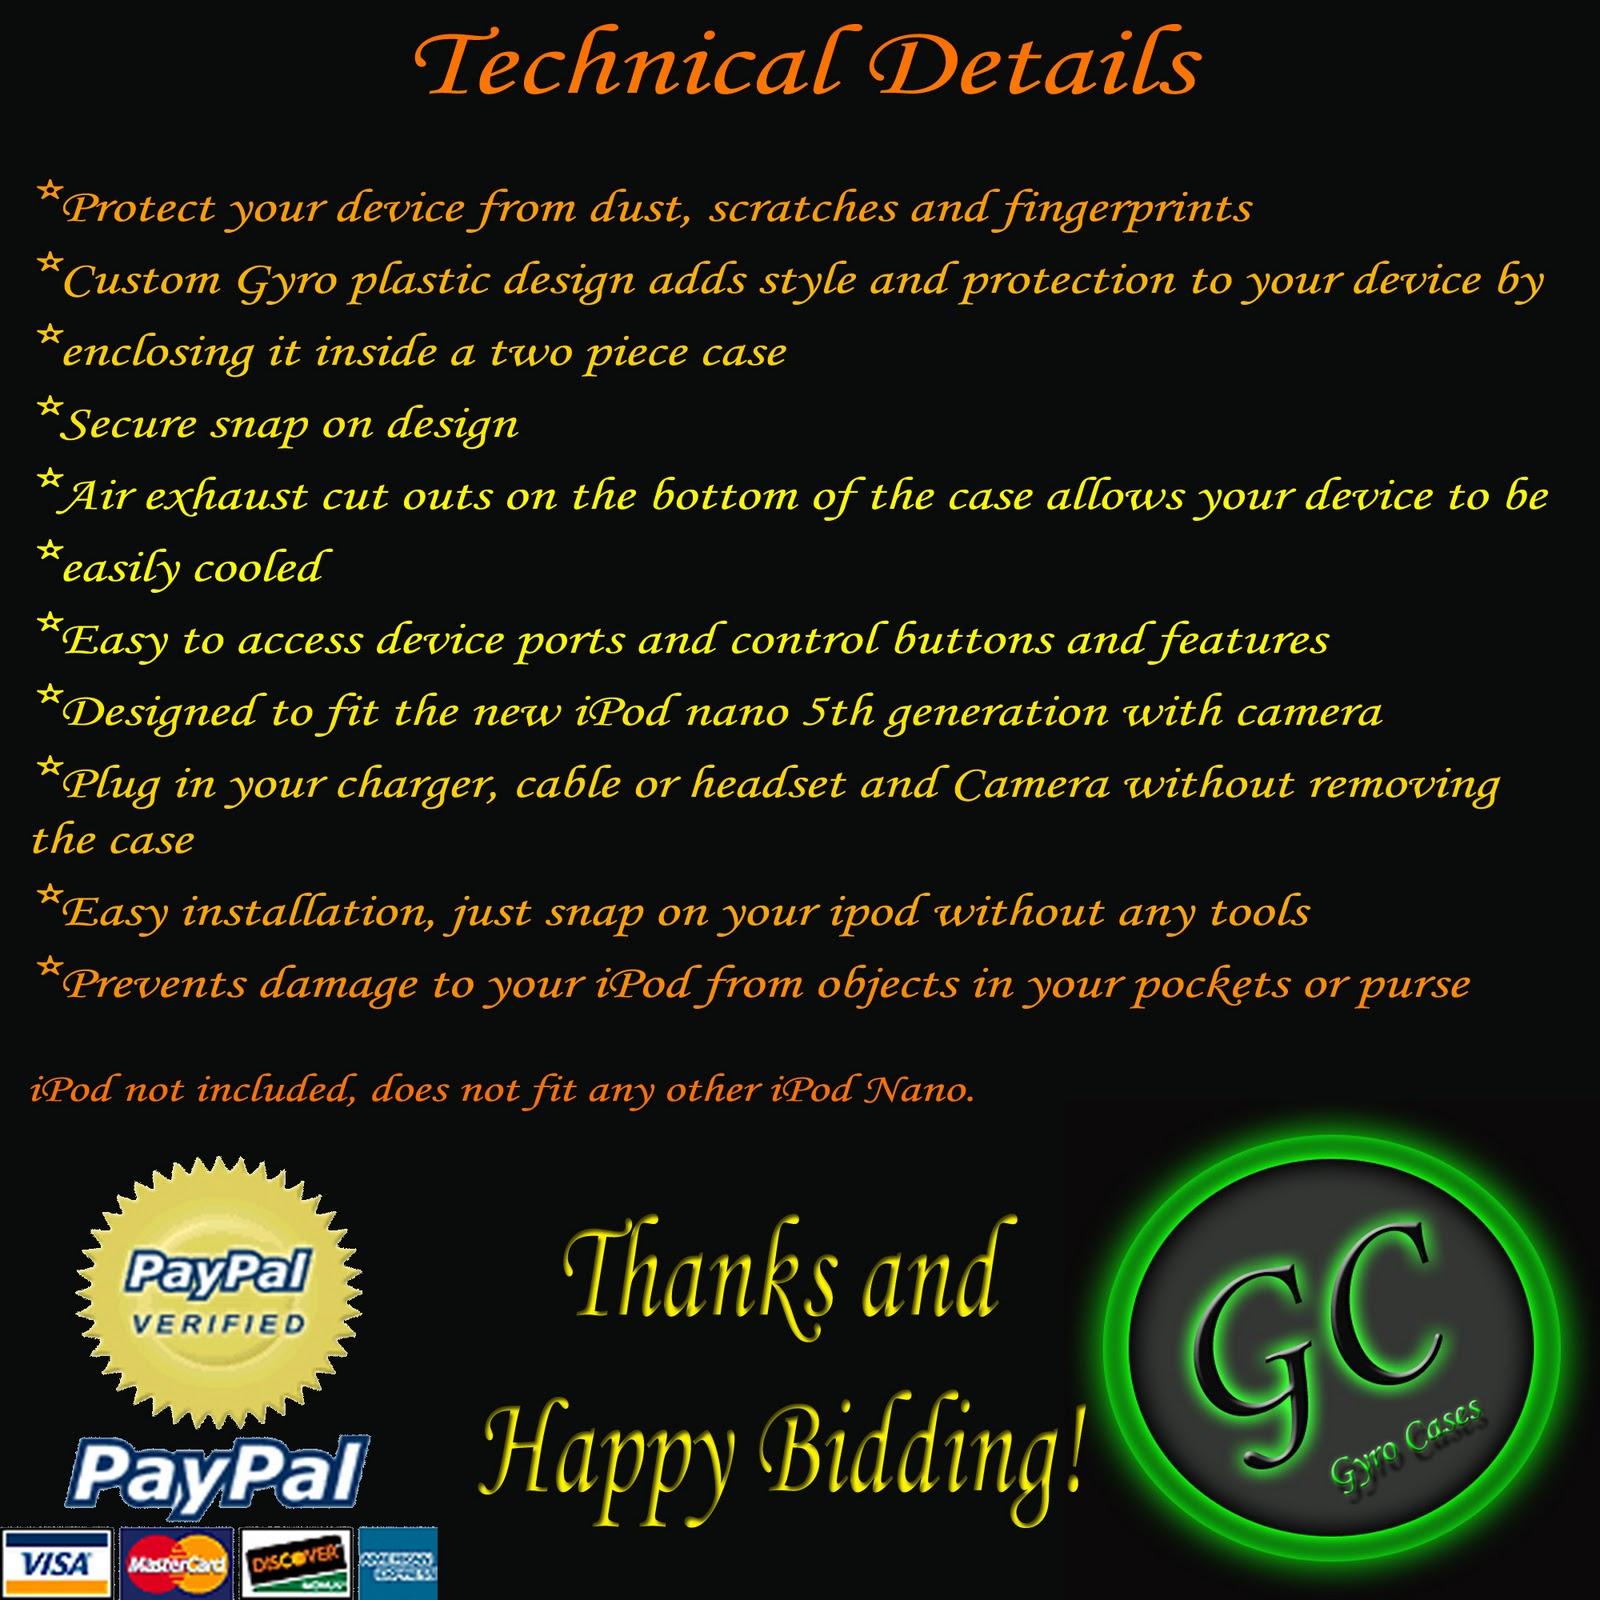 http://4.bp.blogspot.com/_GxFkQo9ftlg/TNxYJRc3CNI/AAAAAAAAARc/flq4wIUCDqA/s1600/ipodinfopg2.jpg